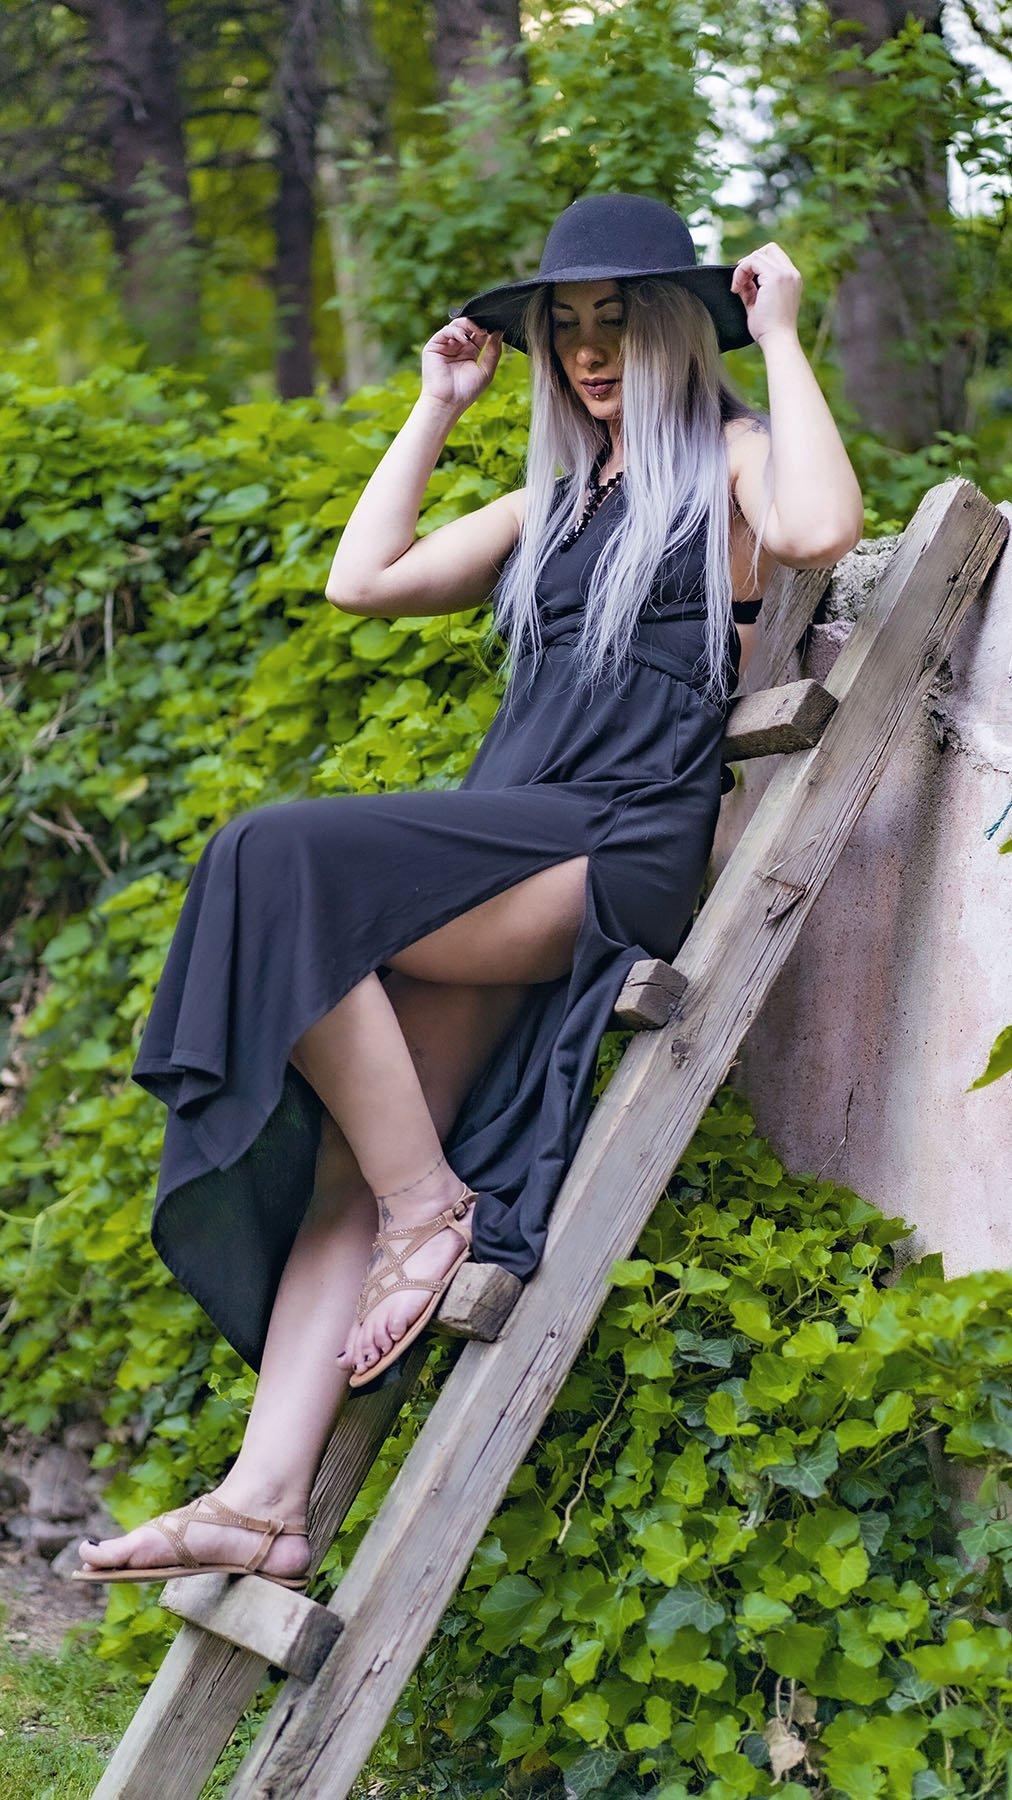 Dis Mekan Fotograf Cekimi Park